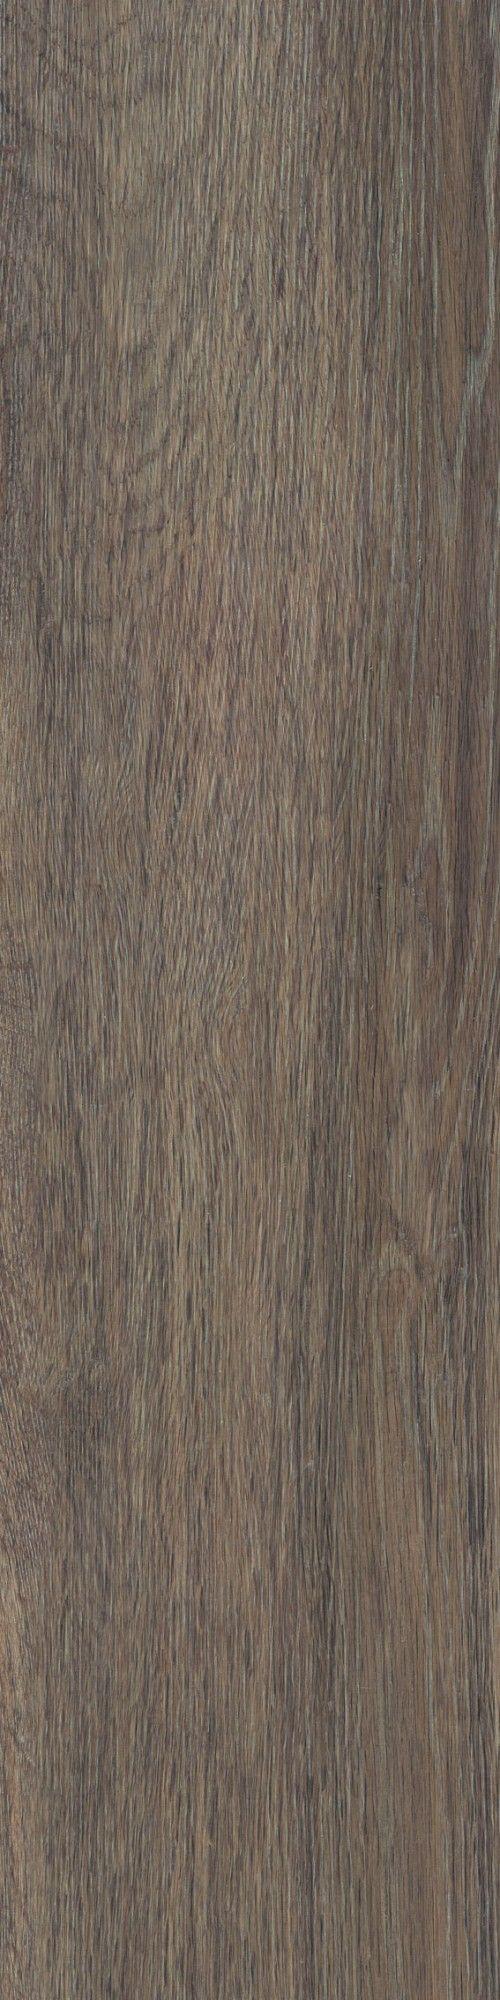 17 Best Ideas About Wood Grain On Pinterest Wood Texture Natural Texture And Wood Grain Texture